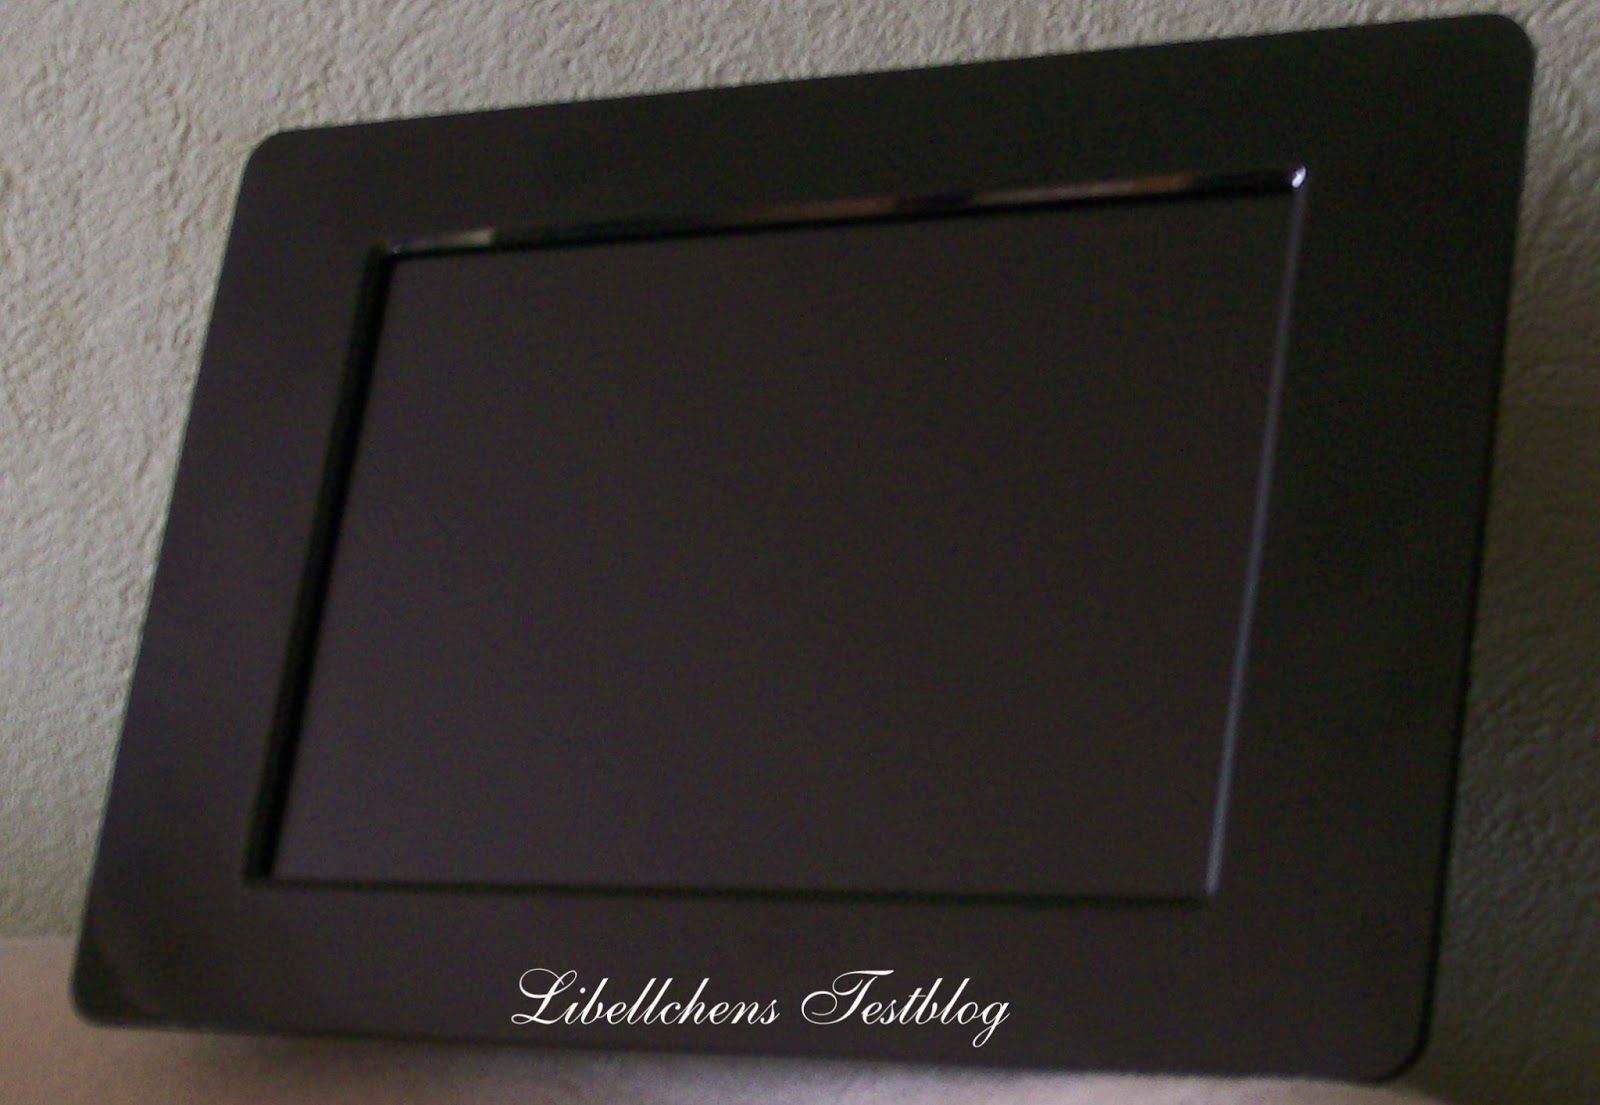 libellchen digitaler bilderrahmen kodak p76. Black Bedroom Furniture Sets. Home Design Ideas